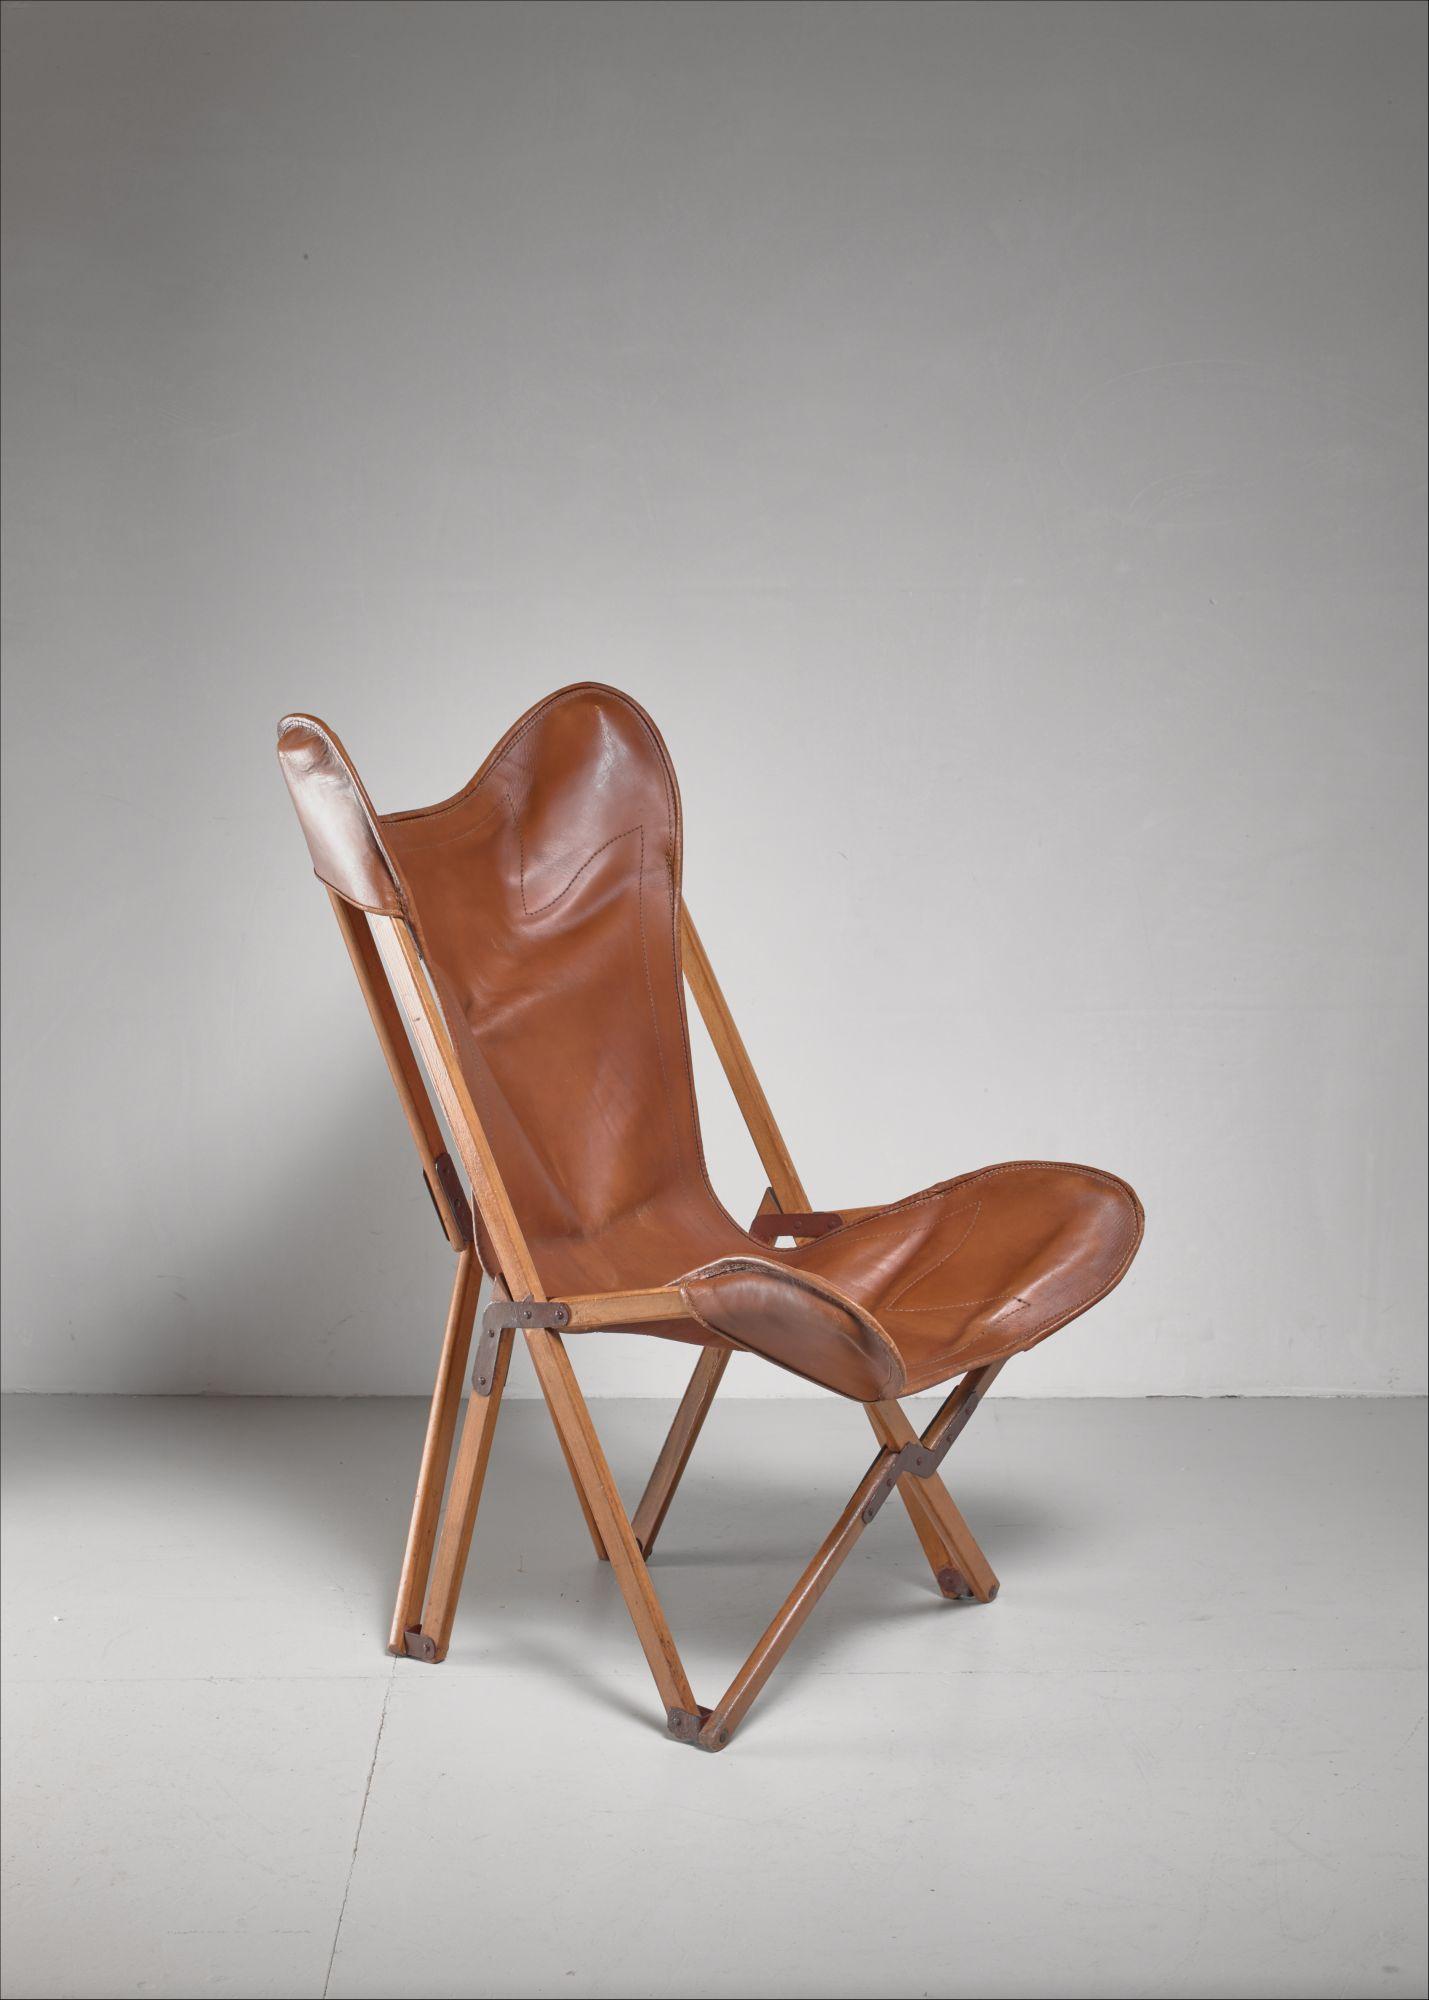 Stupendous Tripolina Folding Chair Italy 1930S Evergreenethics Interior Chair Design Evergreenethicsorg